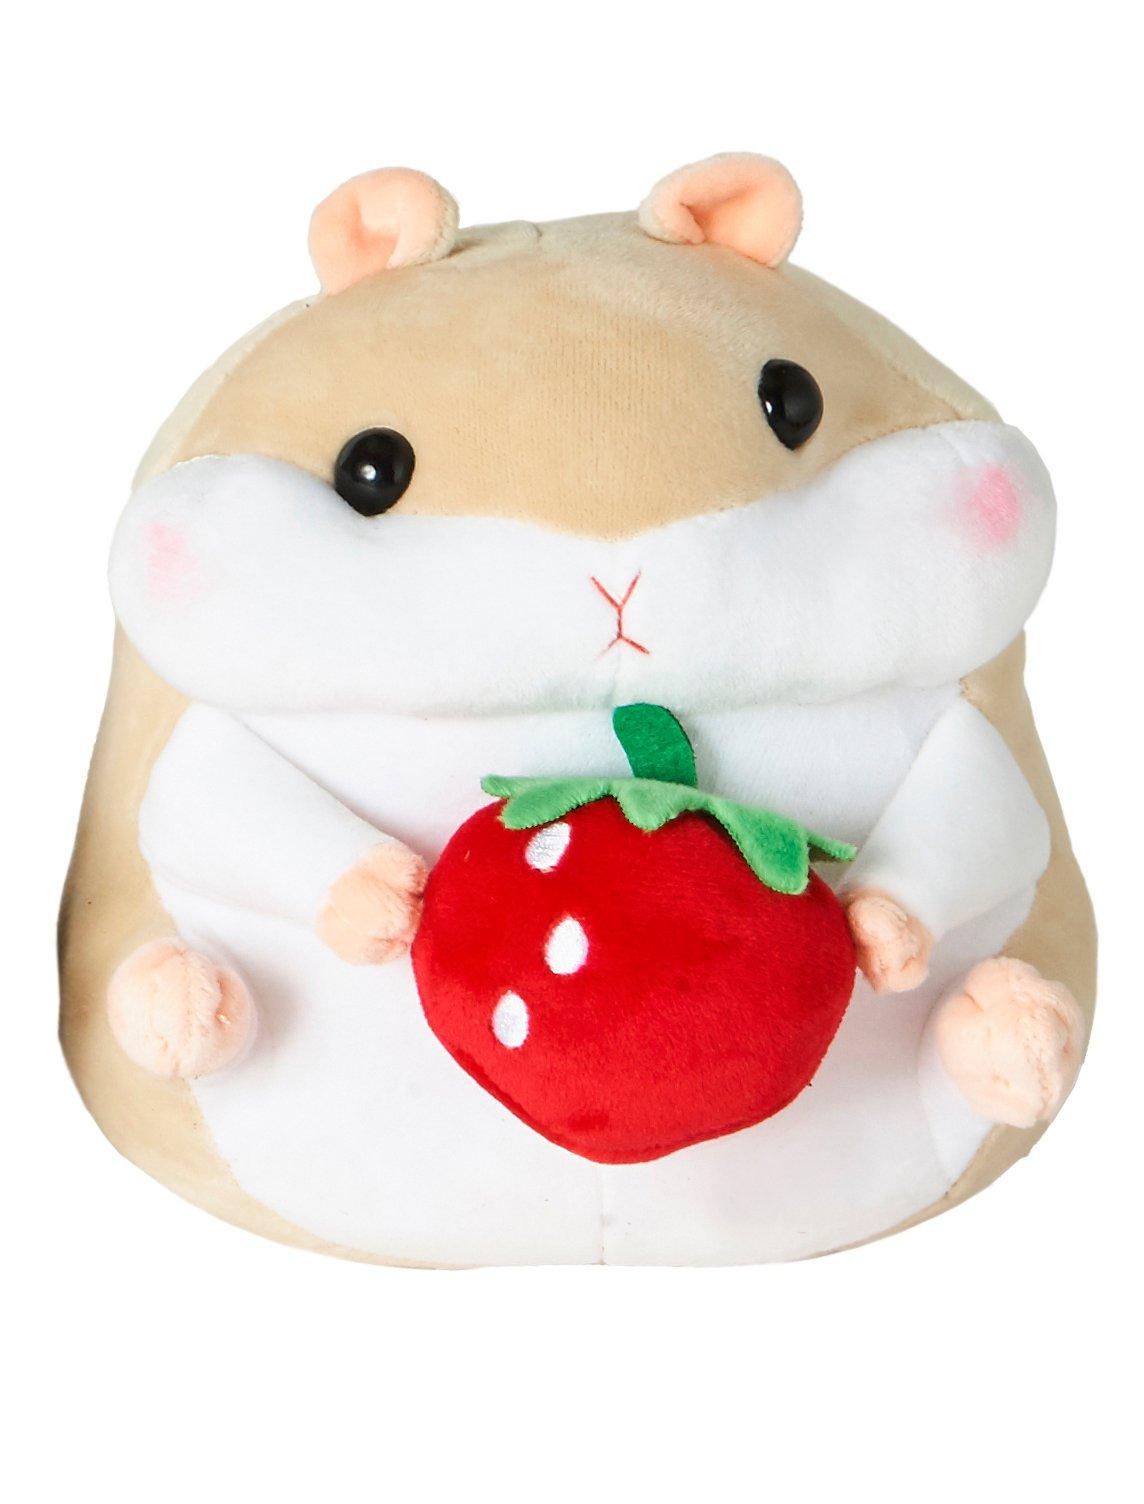 "Shinjidai Scooshin Cute Ultra Soft Stuffed Animal Plush 7.5"" Hamster - Ivory with Strawberry"